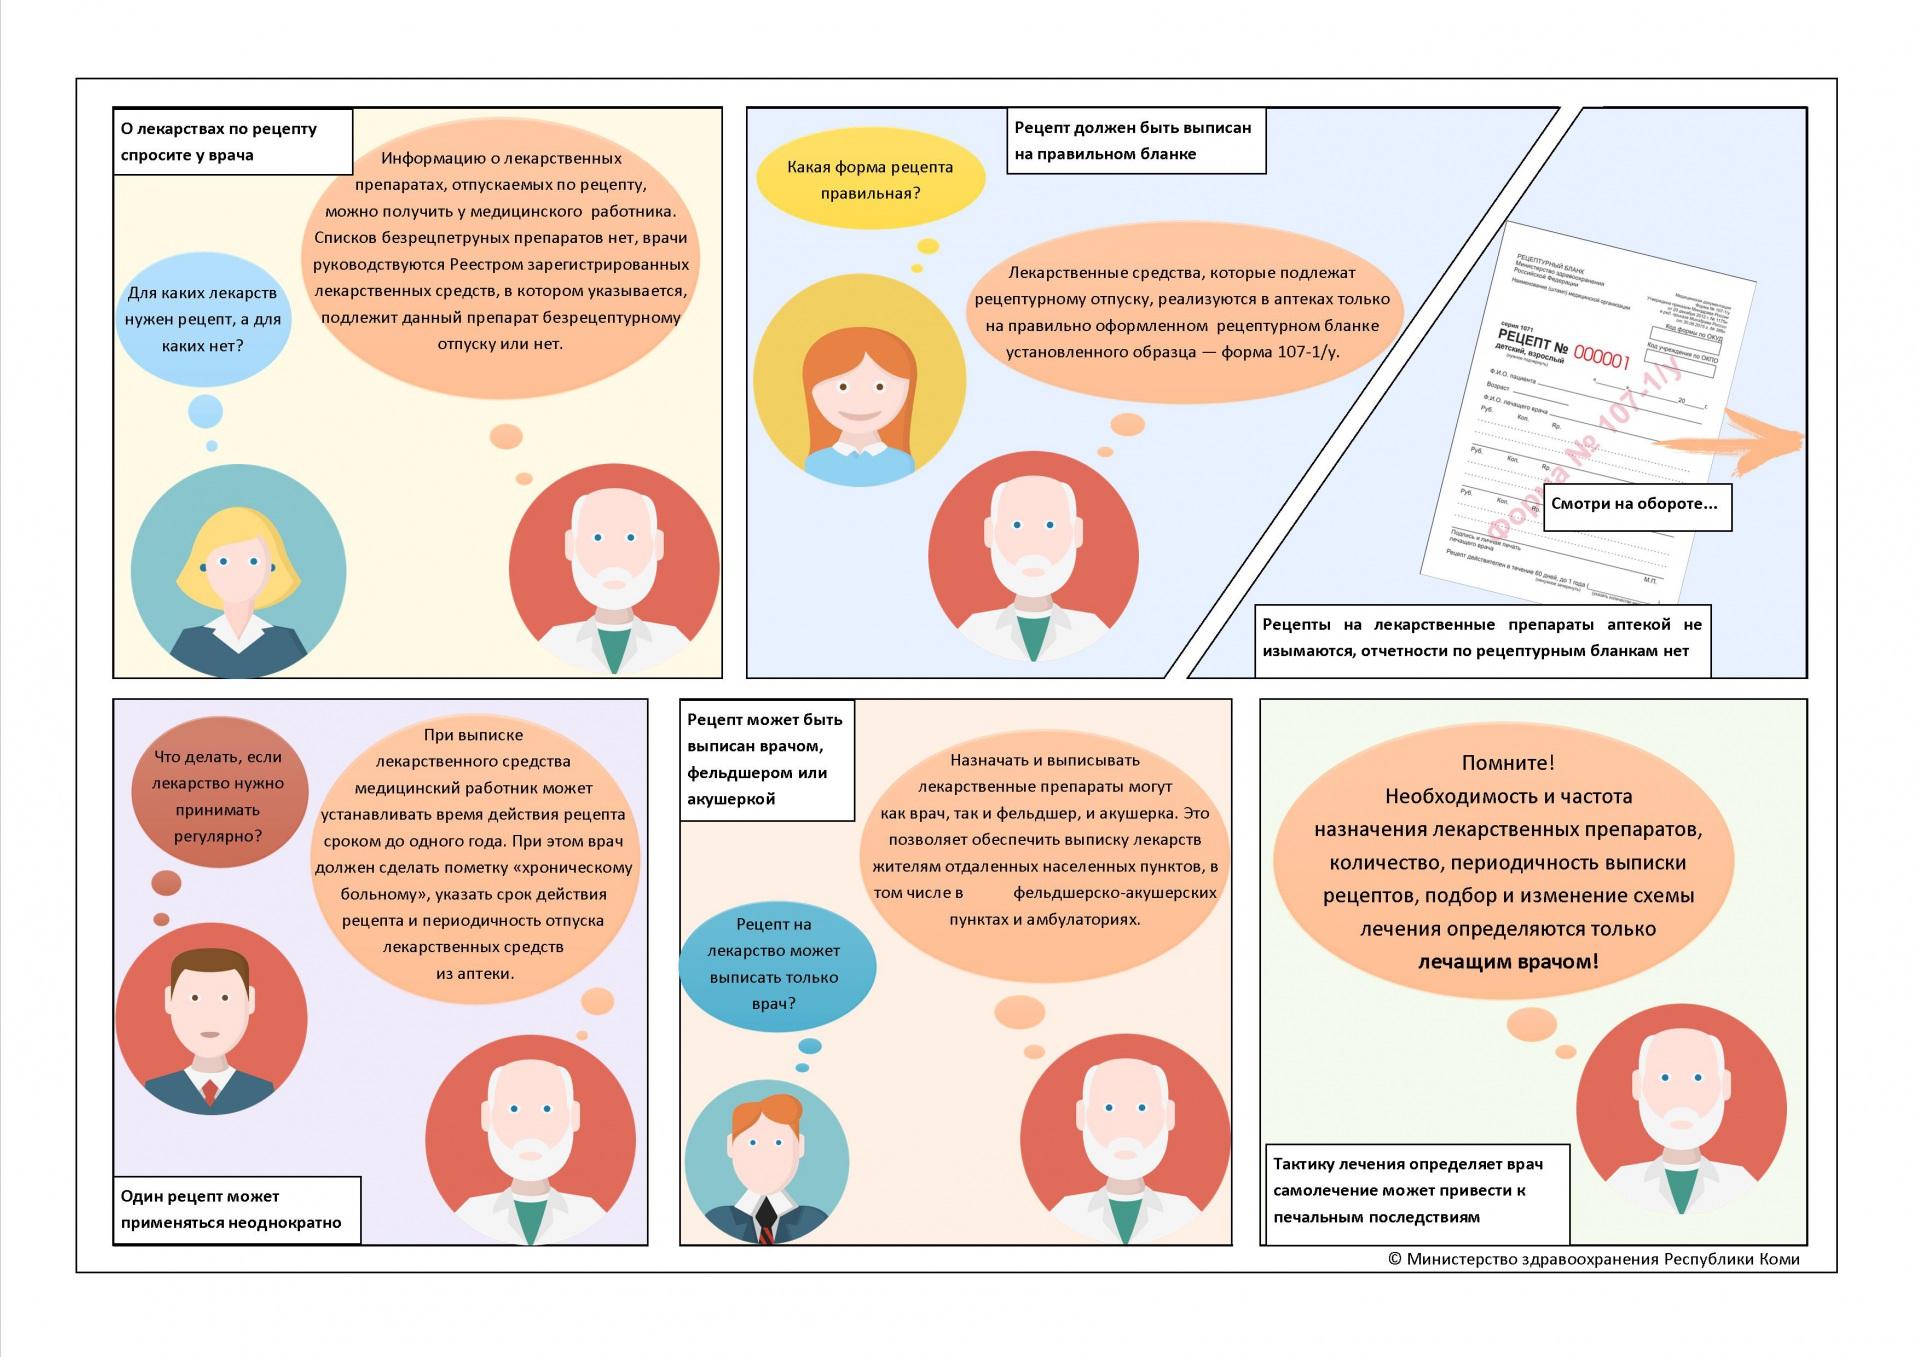 Минздрав Коми разработал памятки о правилах рецептурного отпуска лекарств